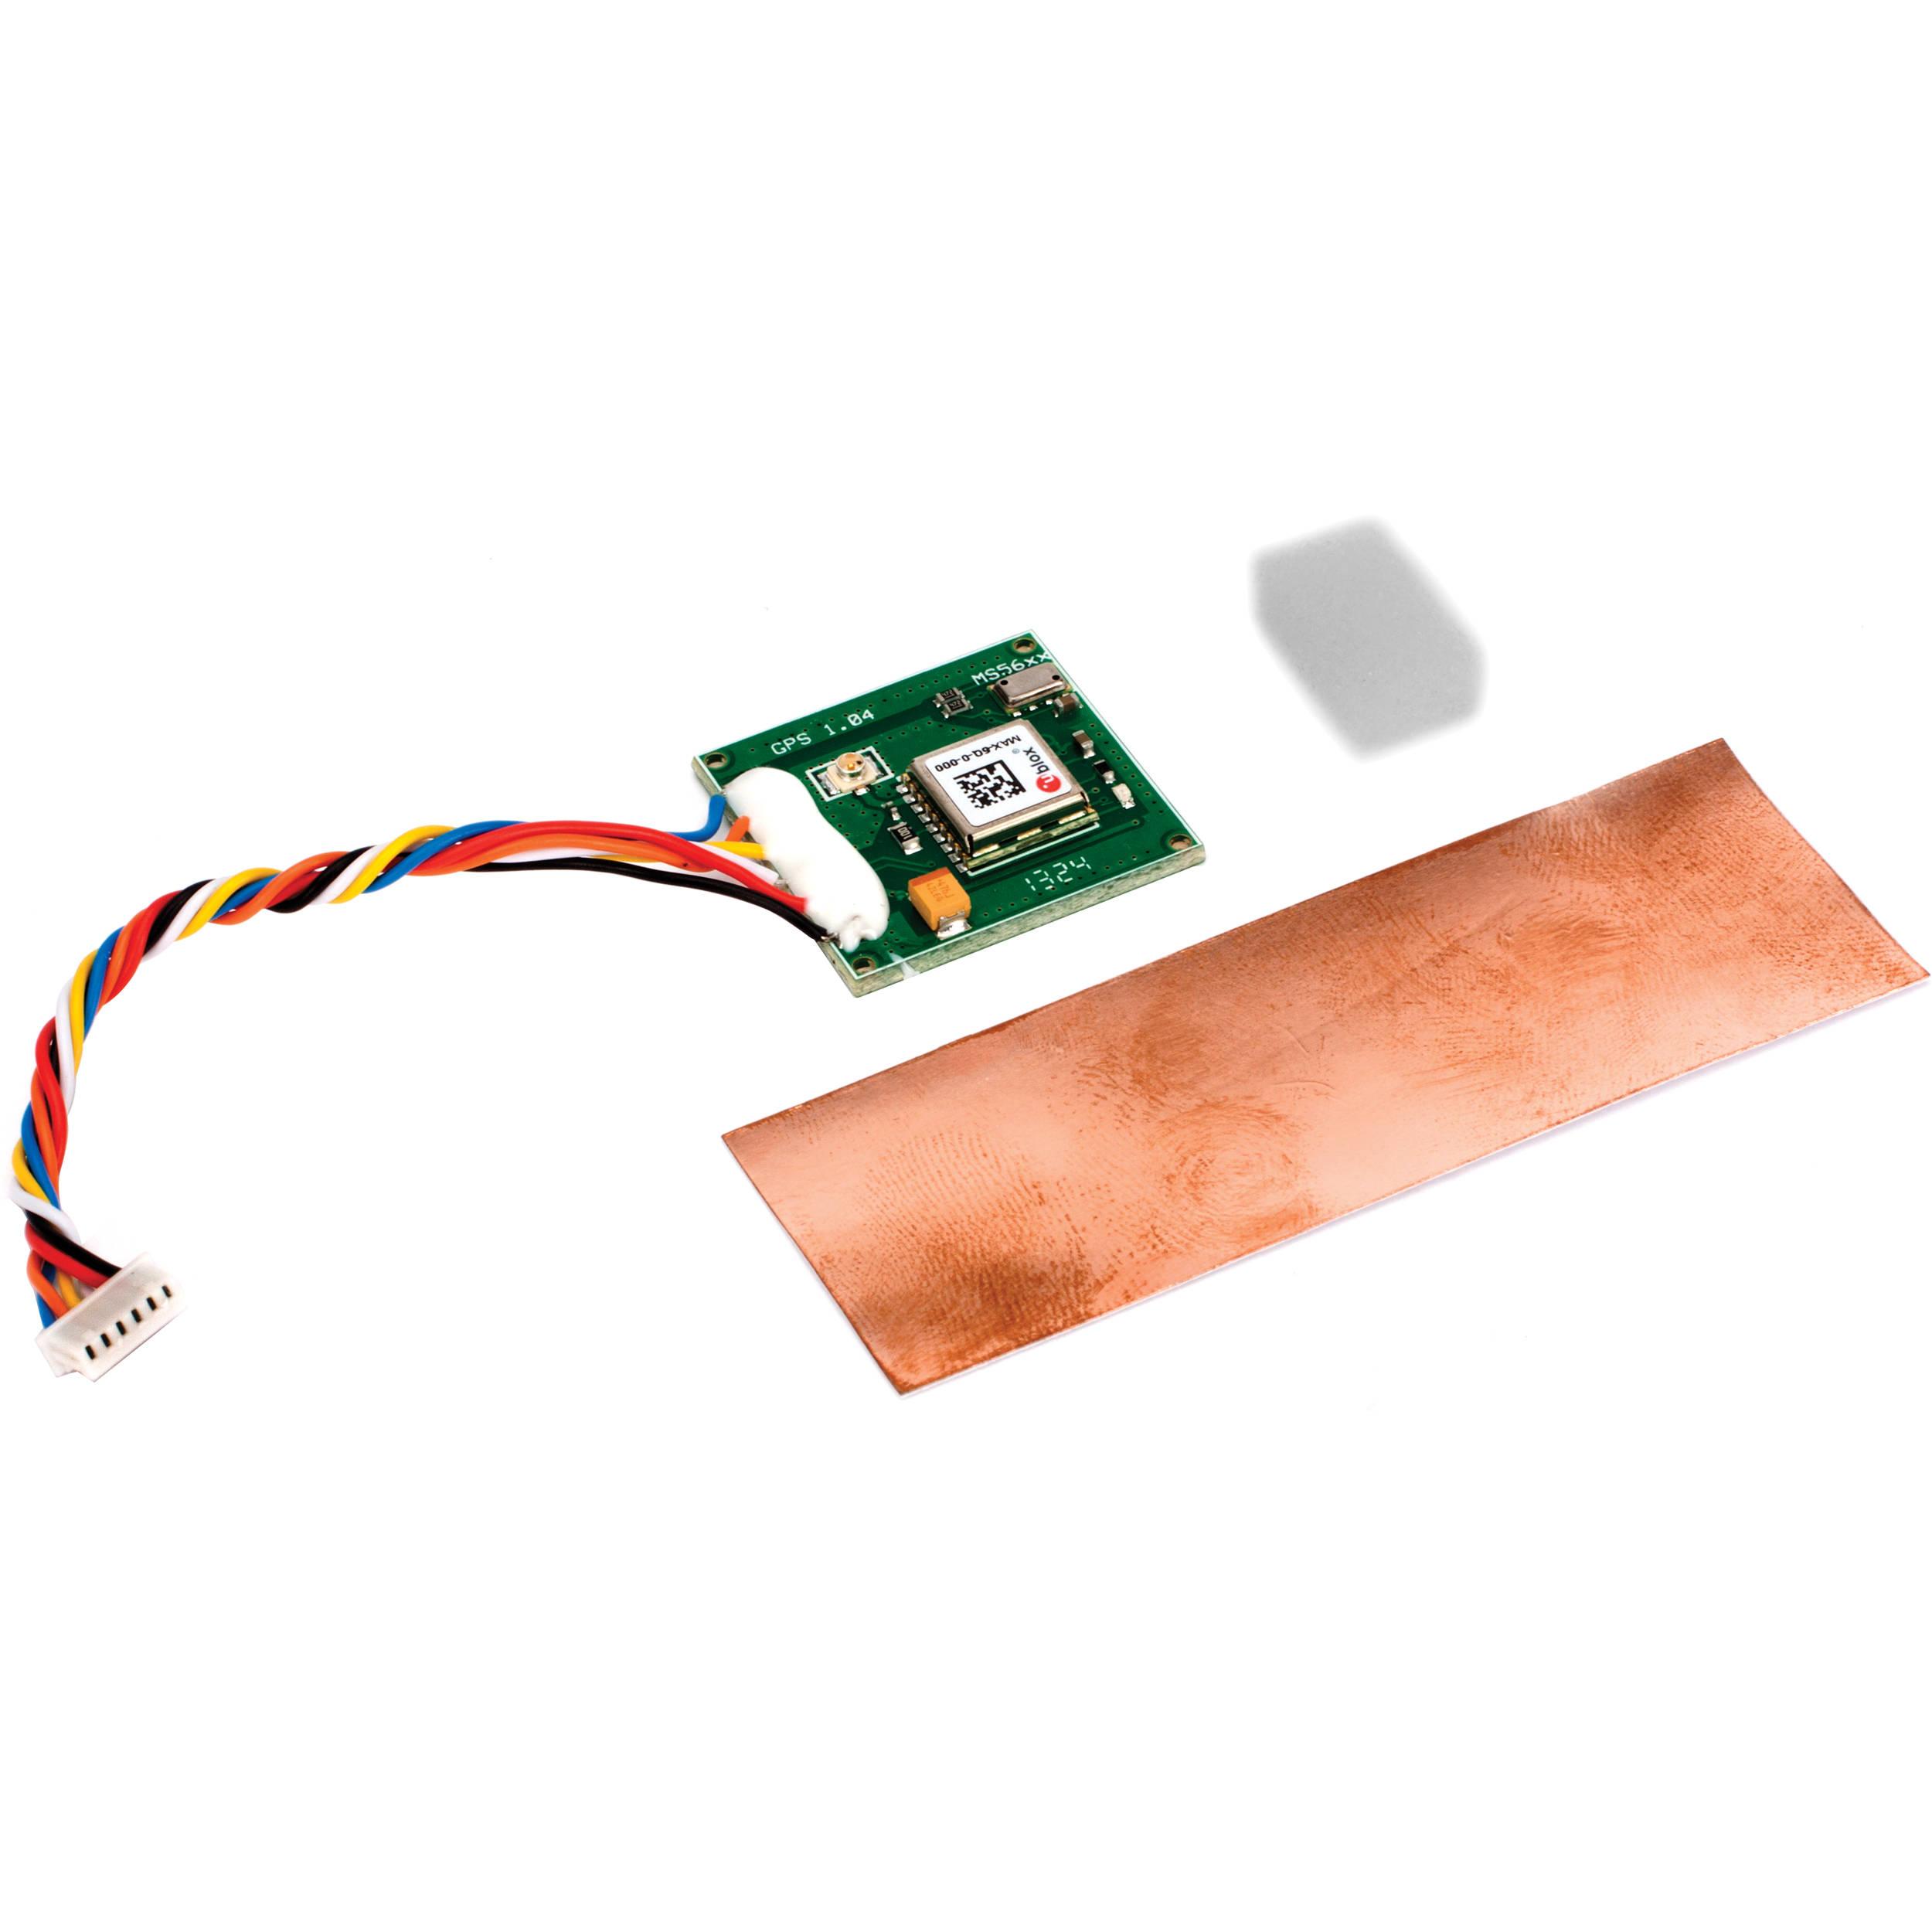 BLADE GPS Receiver with Altimeter for 350 QX Quadcopter